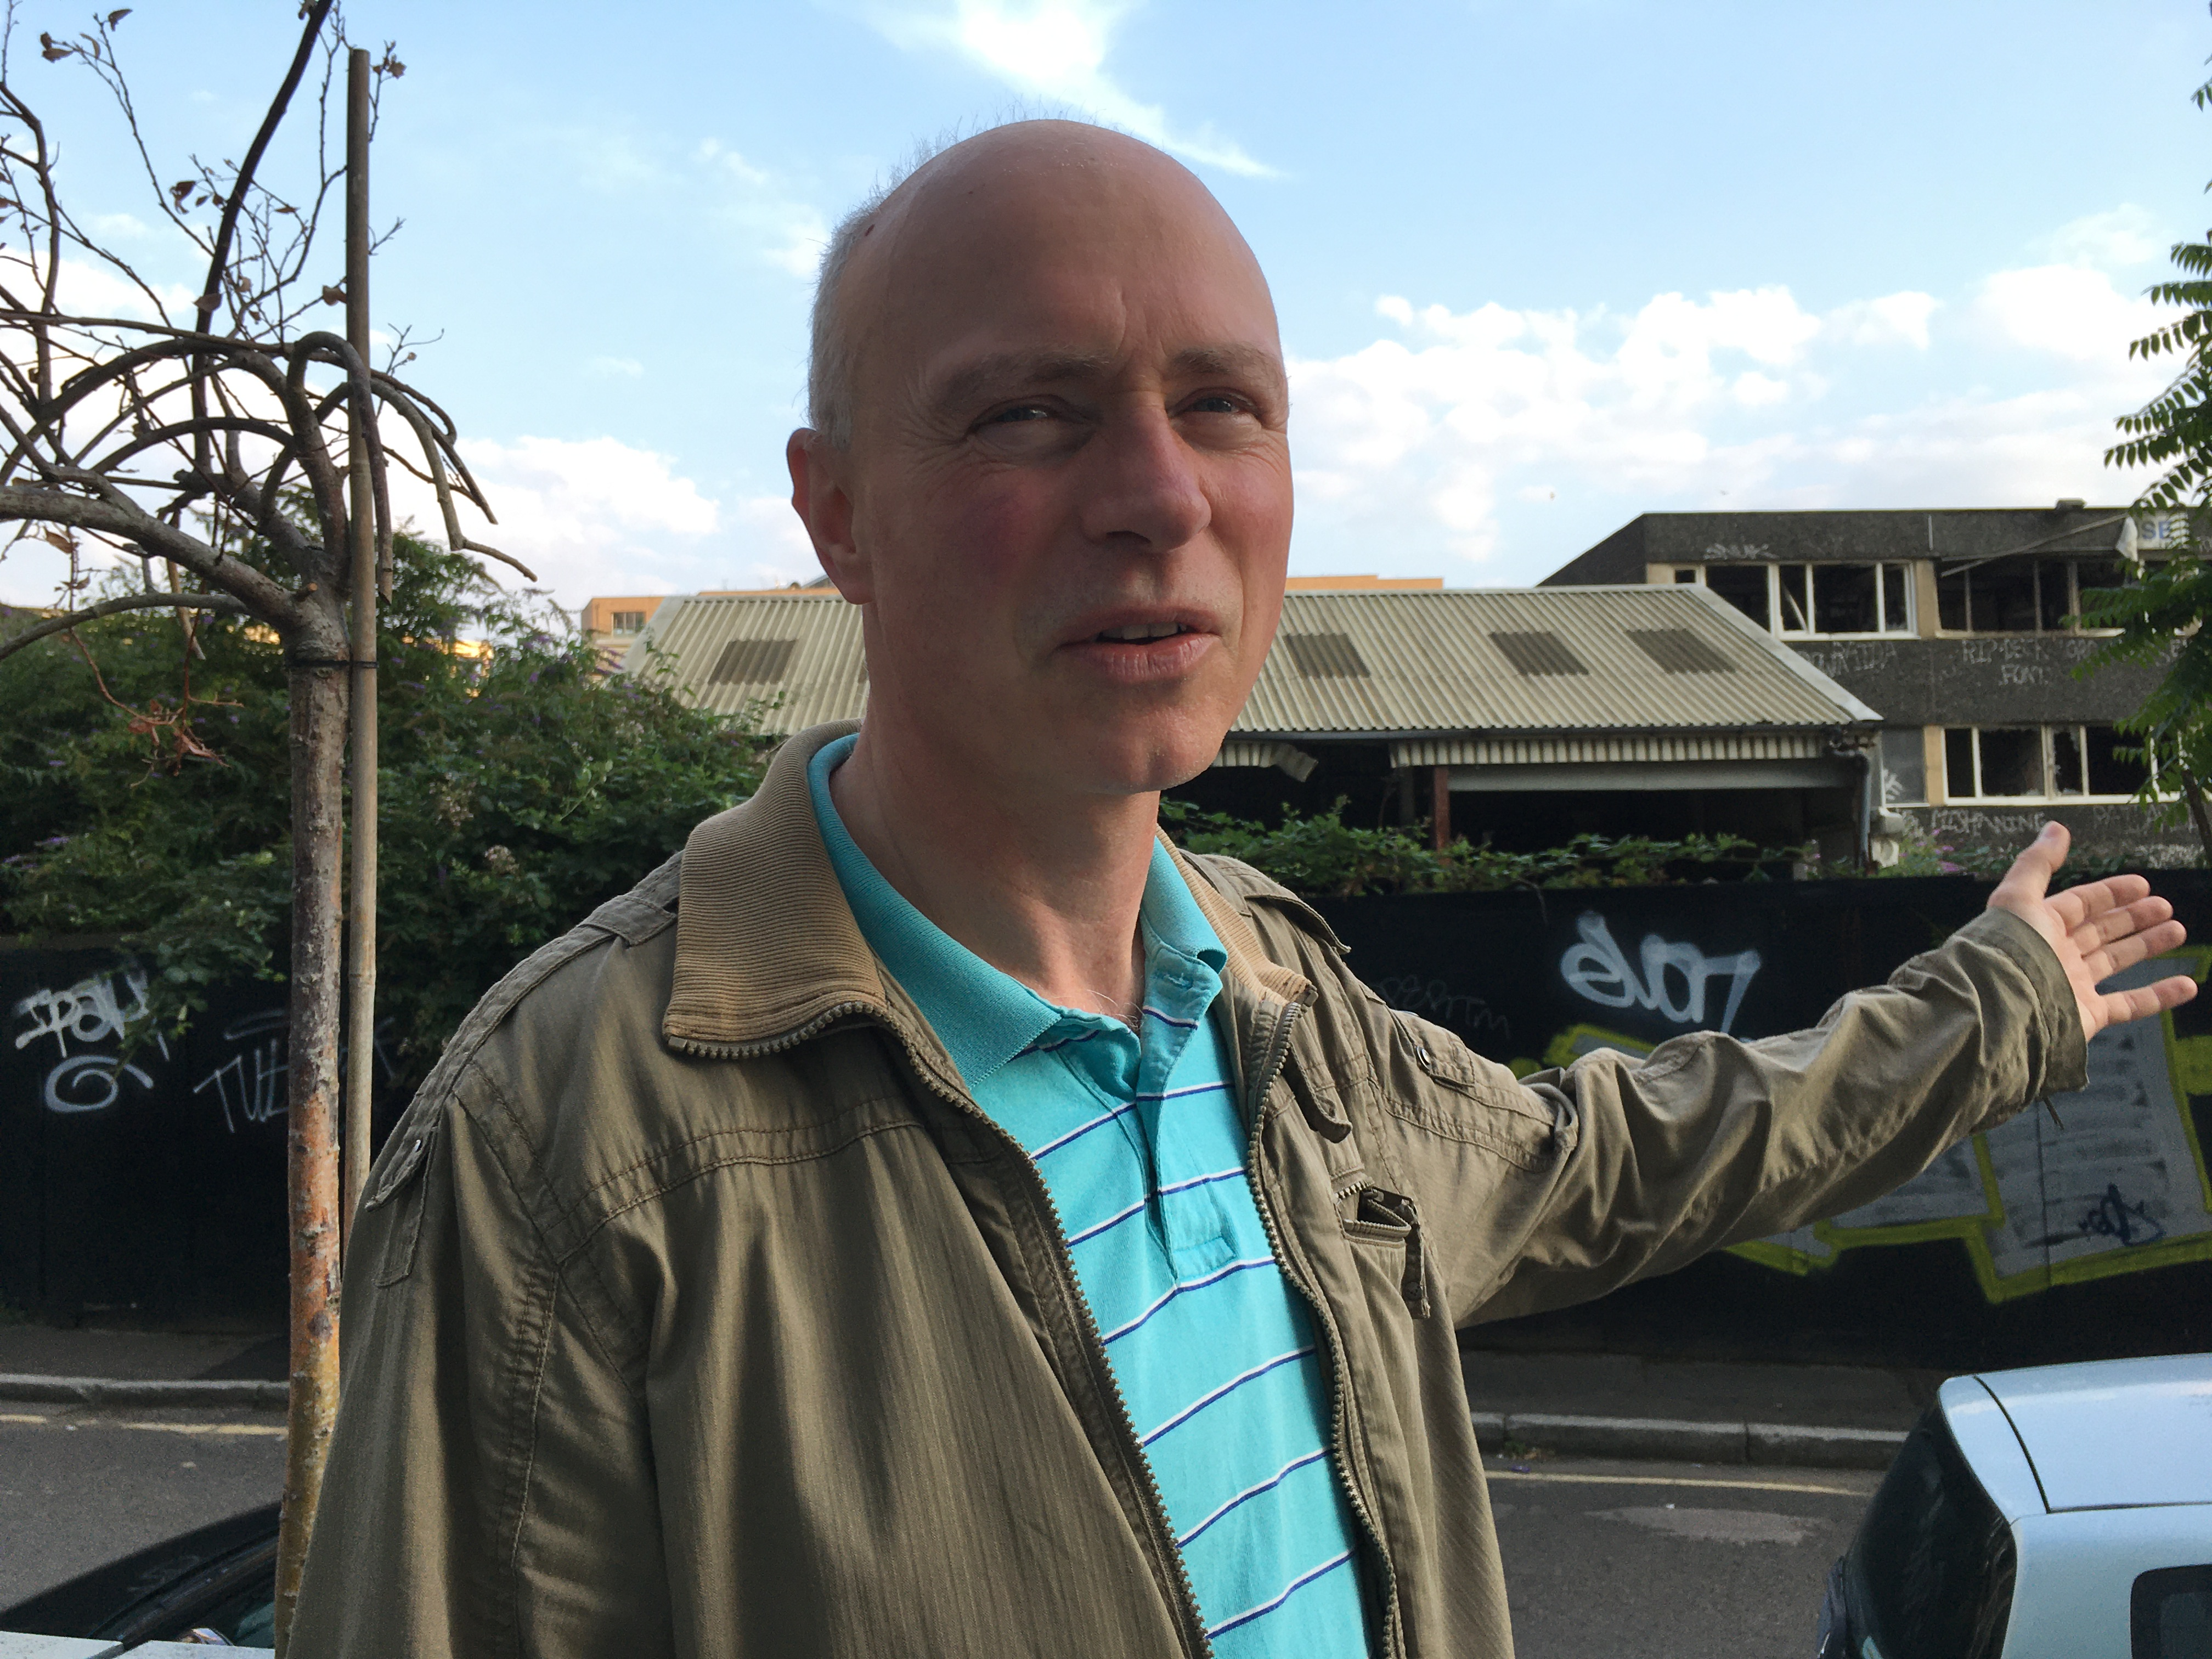 Labour-run Lewisham Council puts profit before housing need